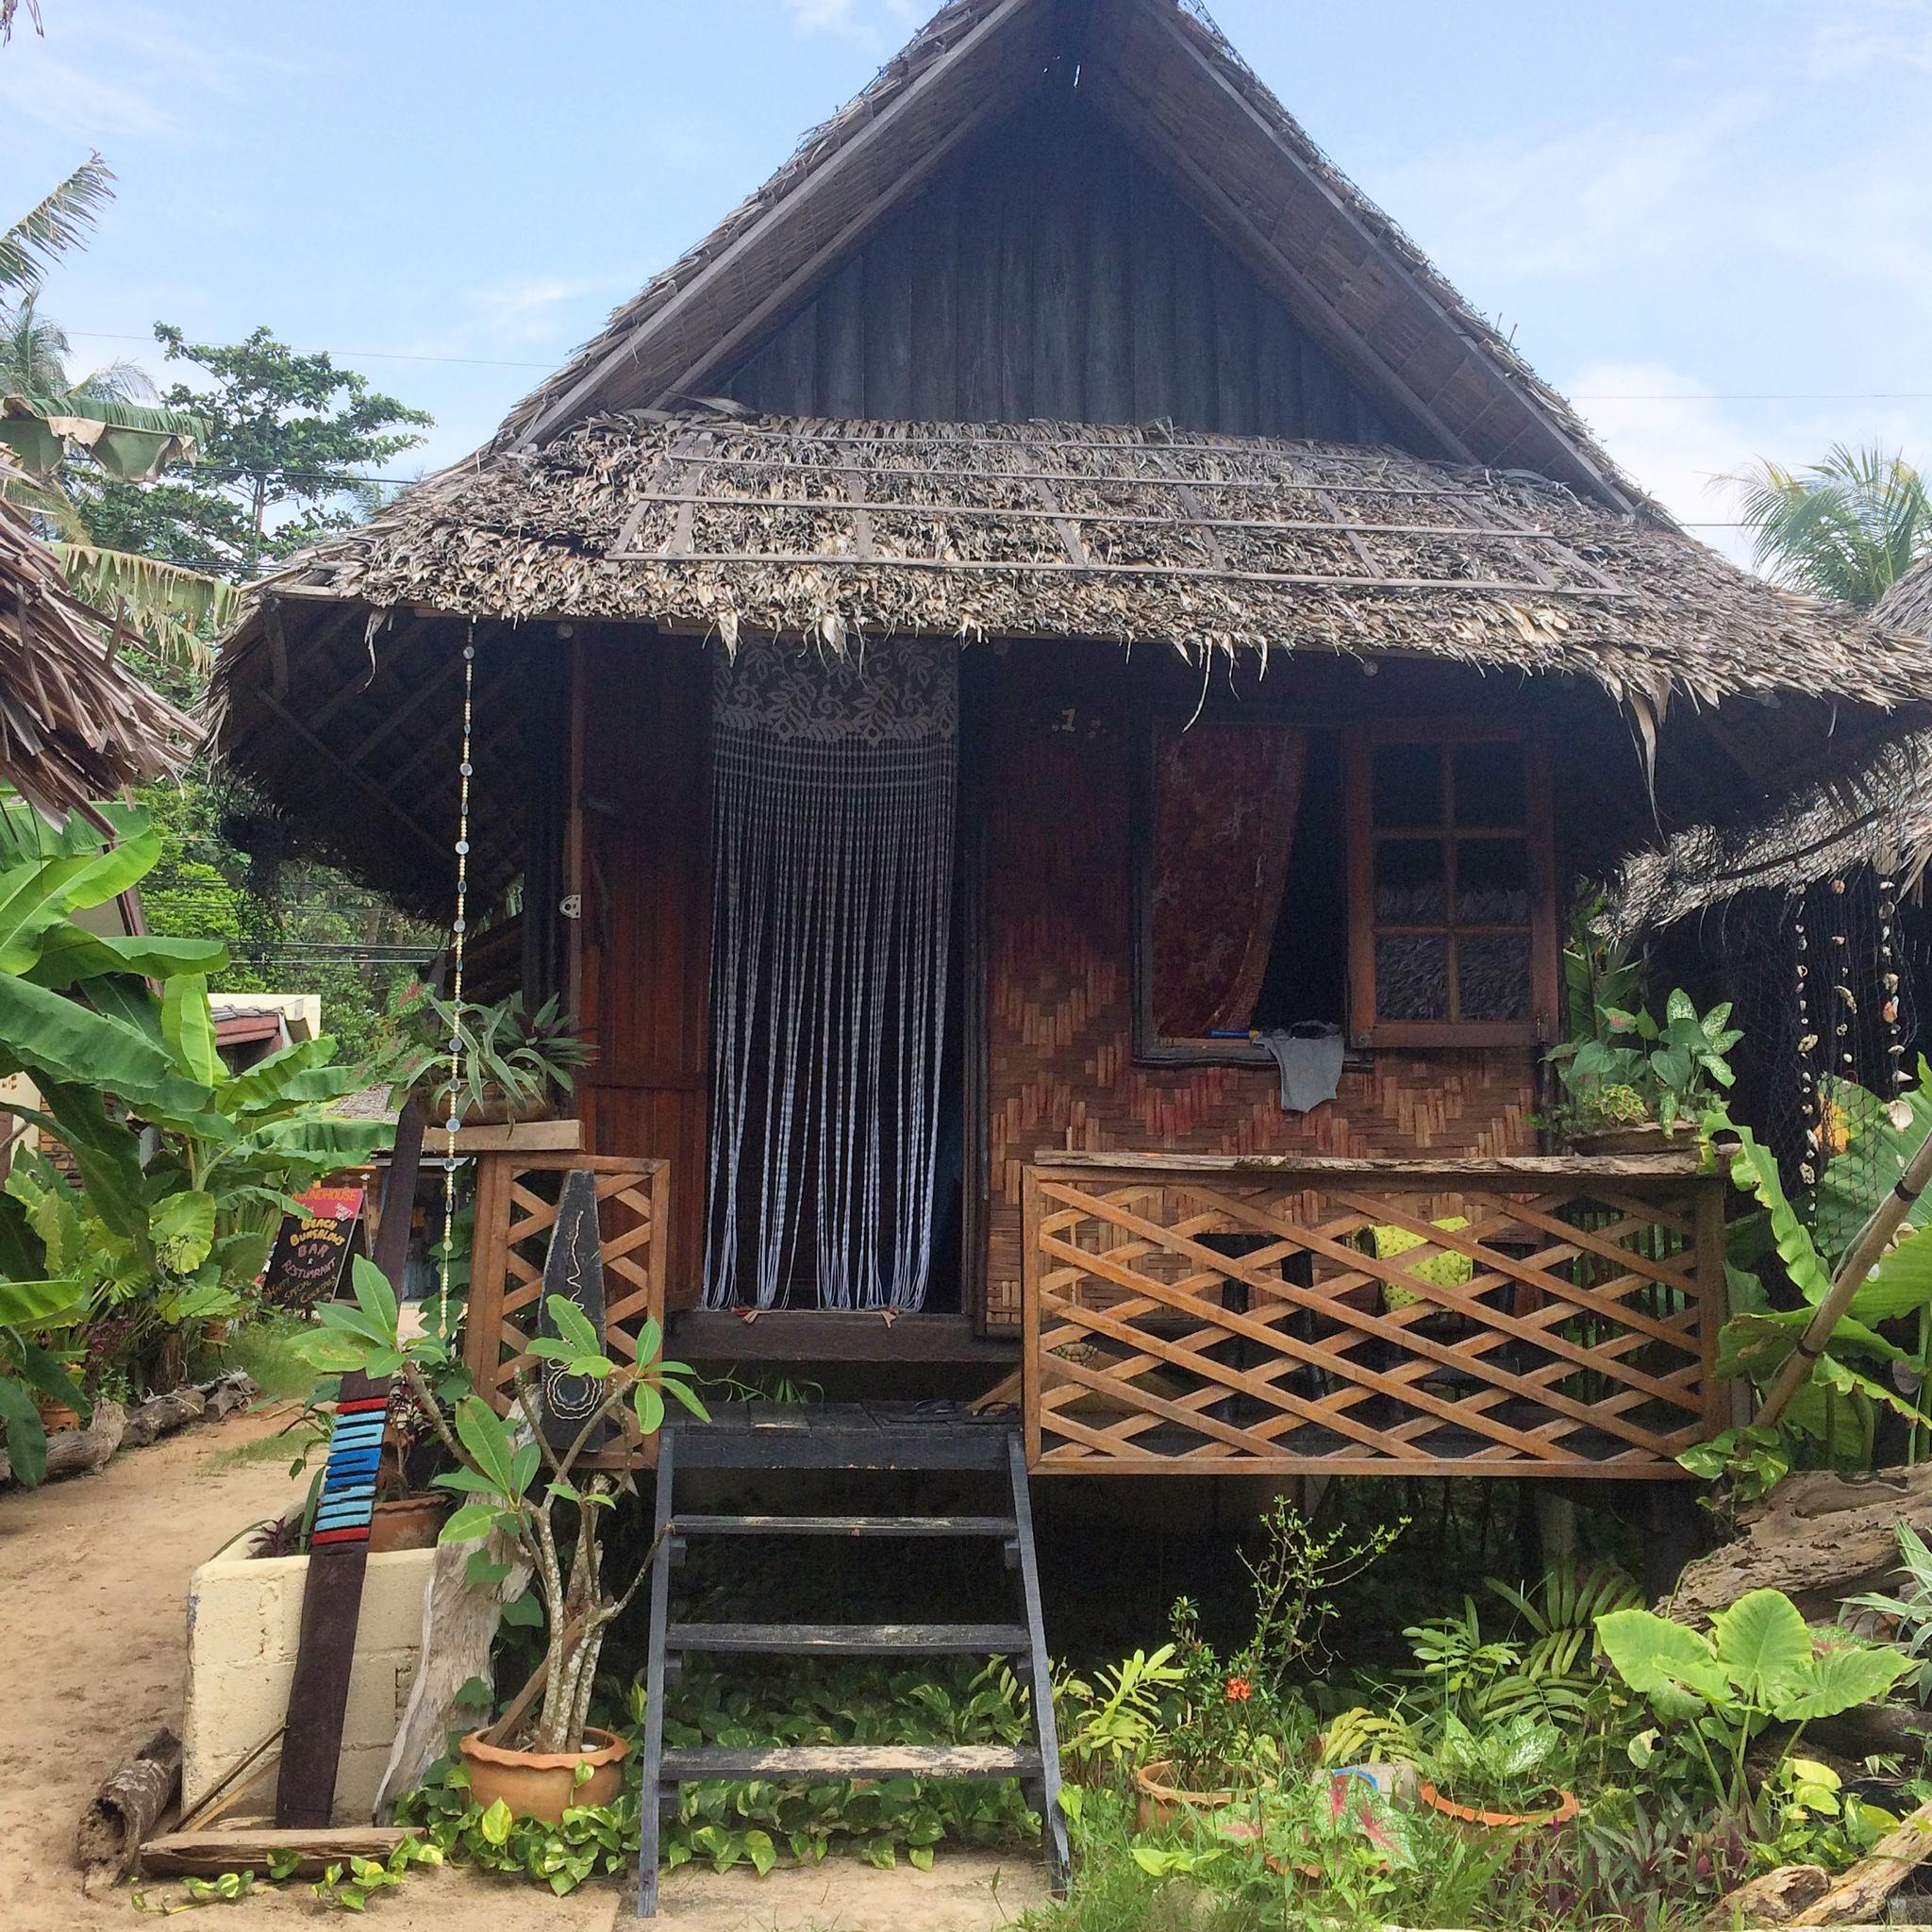 Beautiful Bungalow Pictures: Beautiful Ko Lanta, Thailand: Lanta Roundhouse And Klong